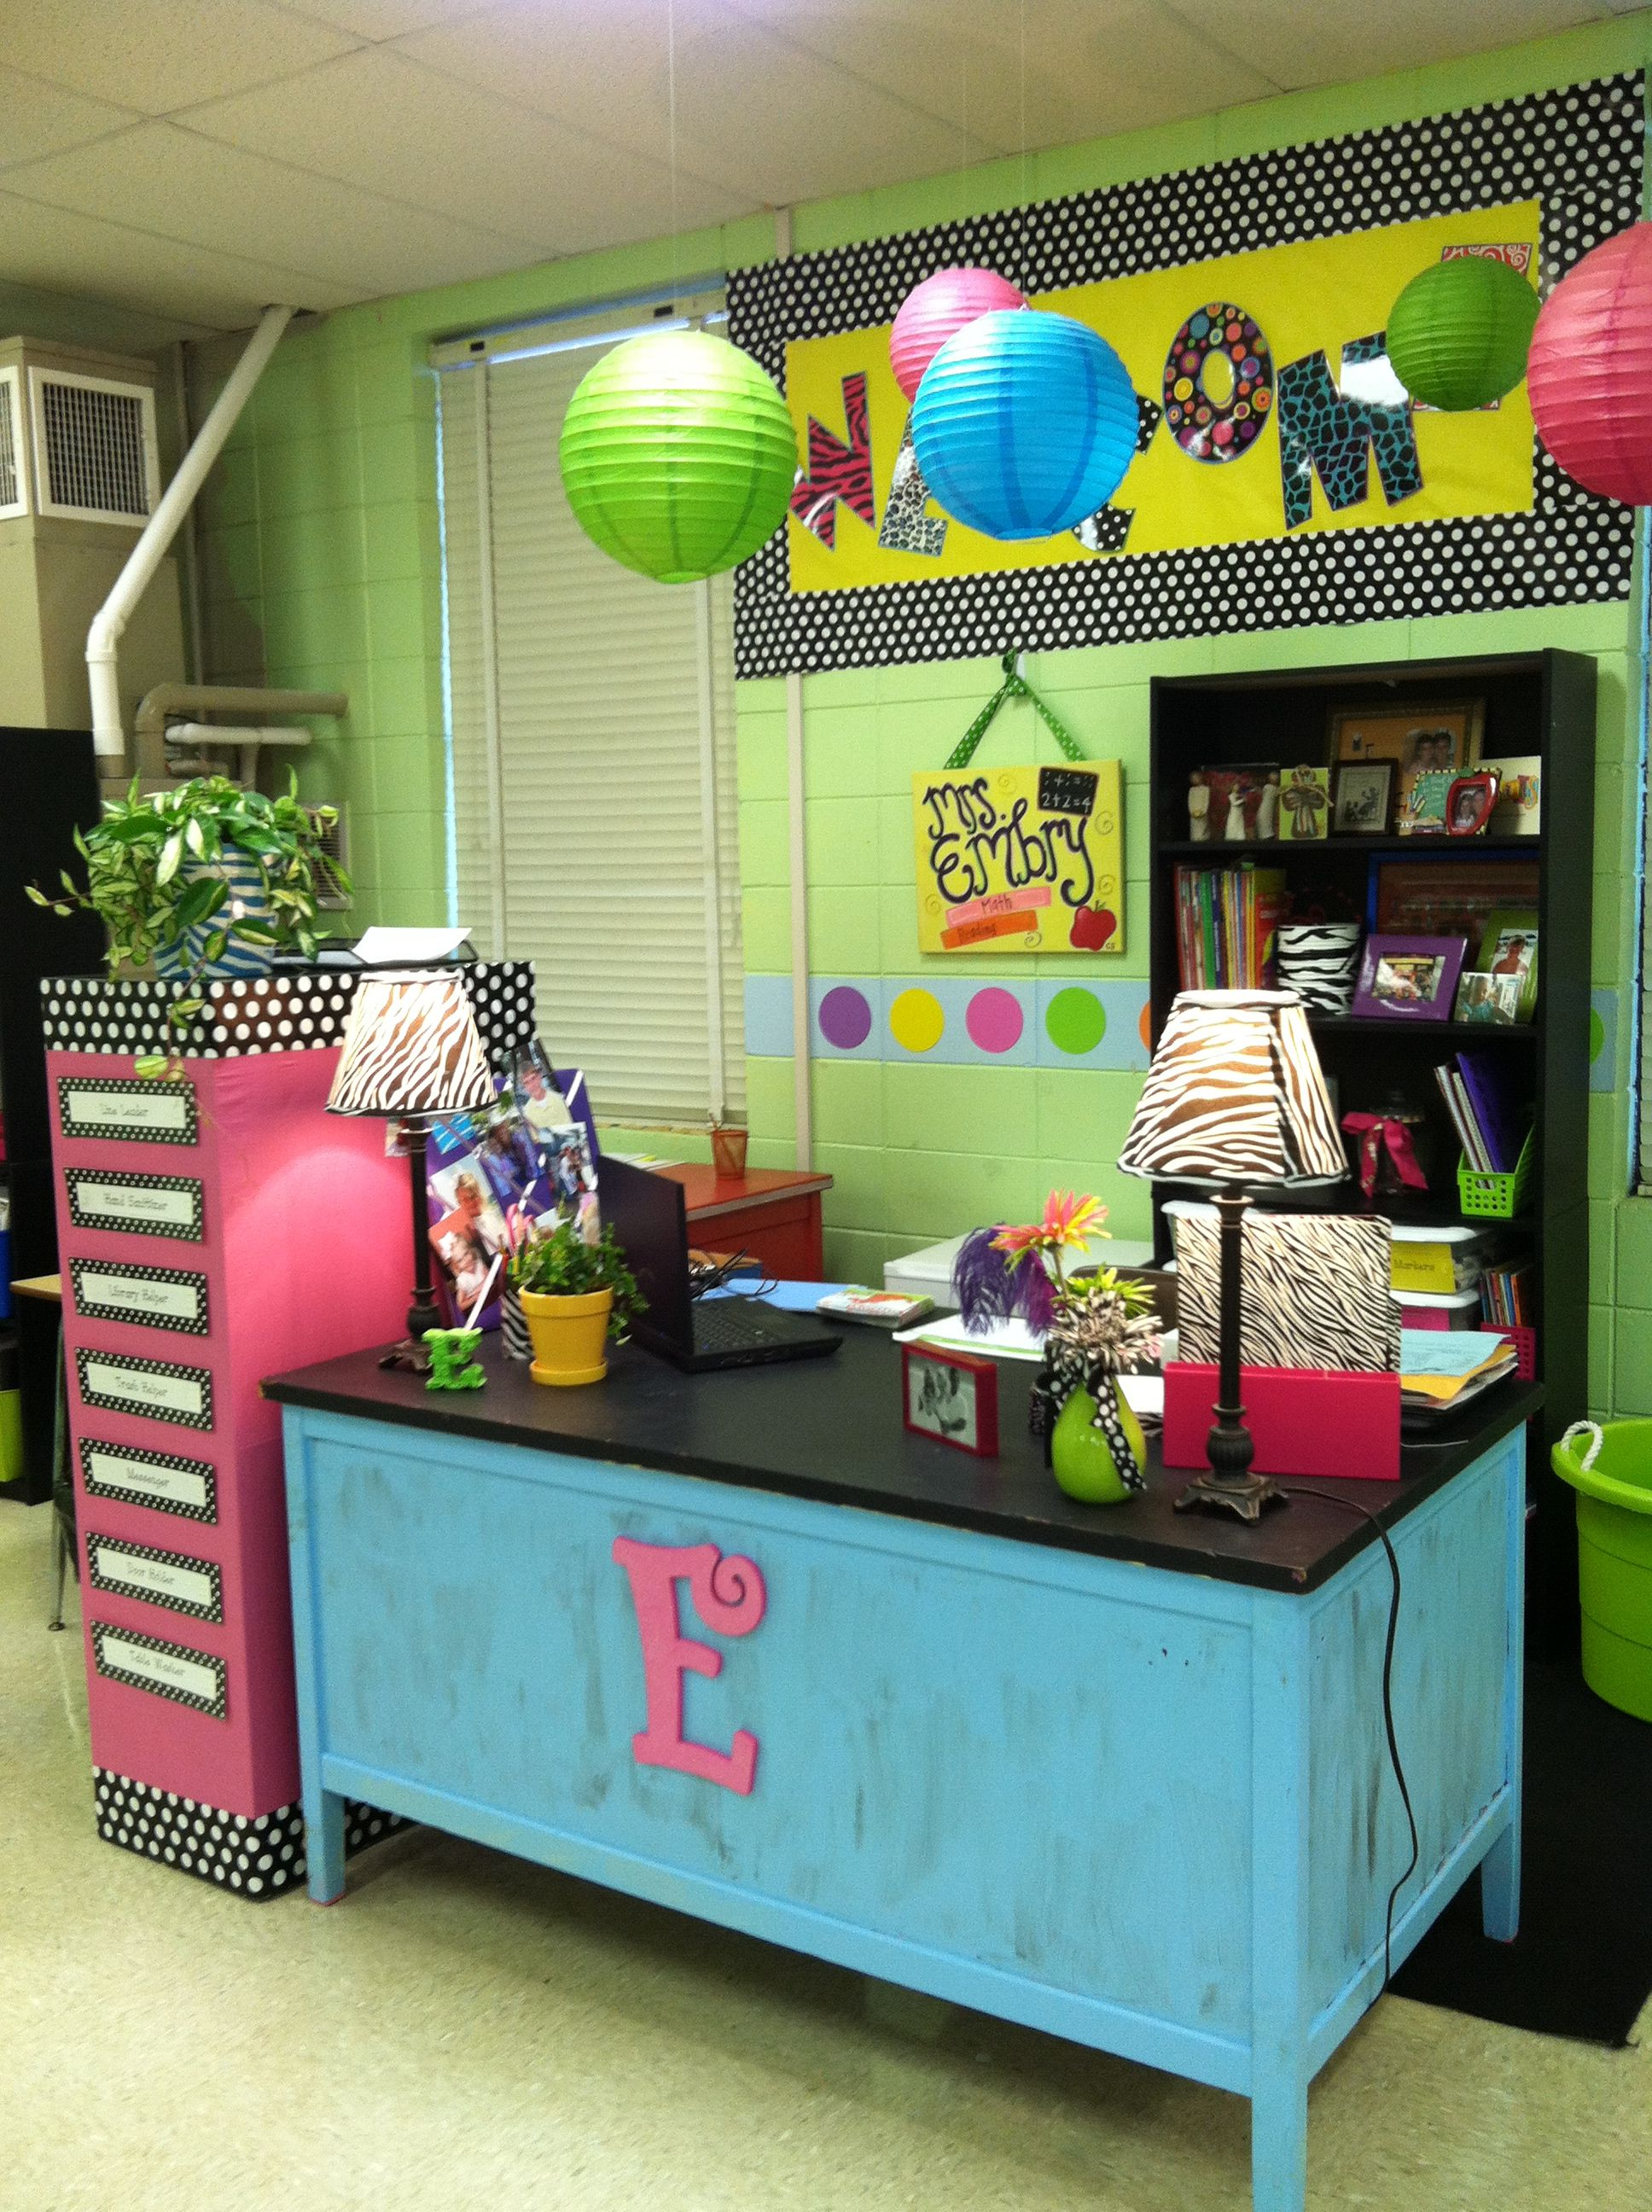 So Cute This Class Room Makes Me Want To Be A Teacher Classroom Decor Teacher Desk Organization Teacher Desk